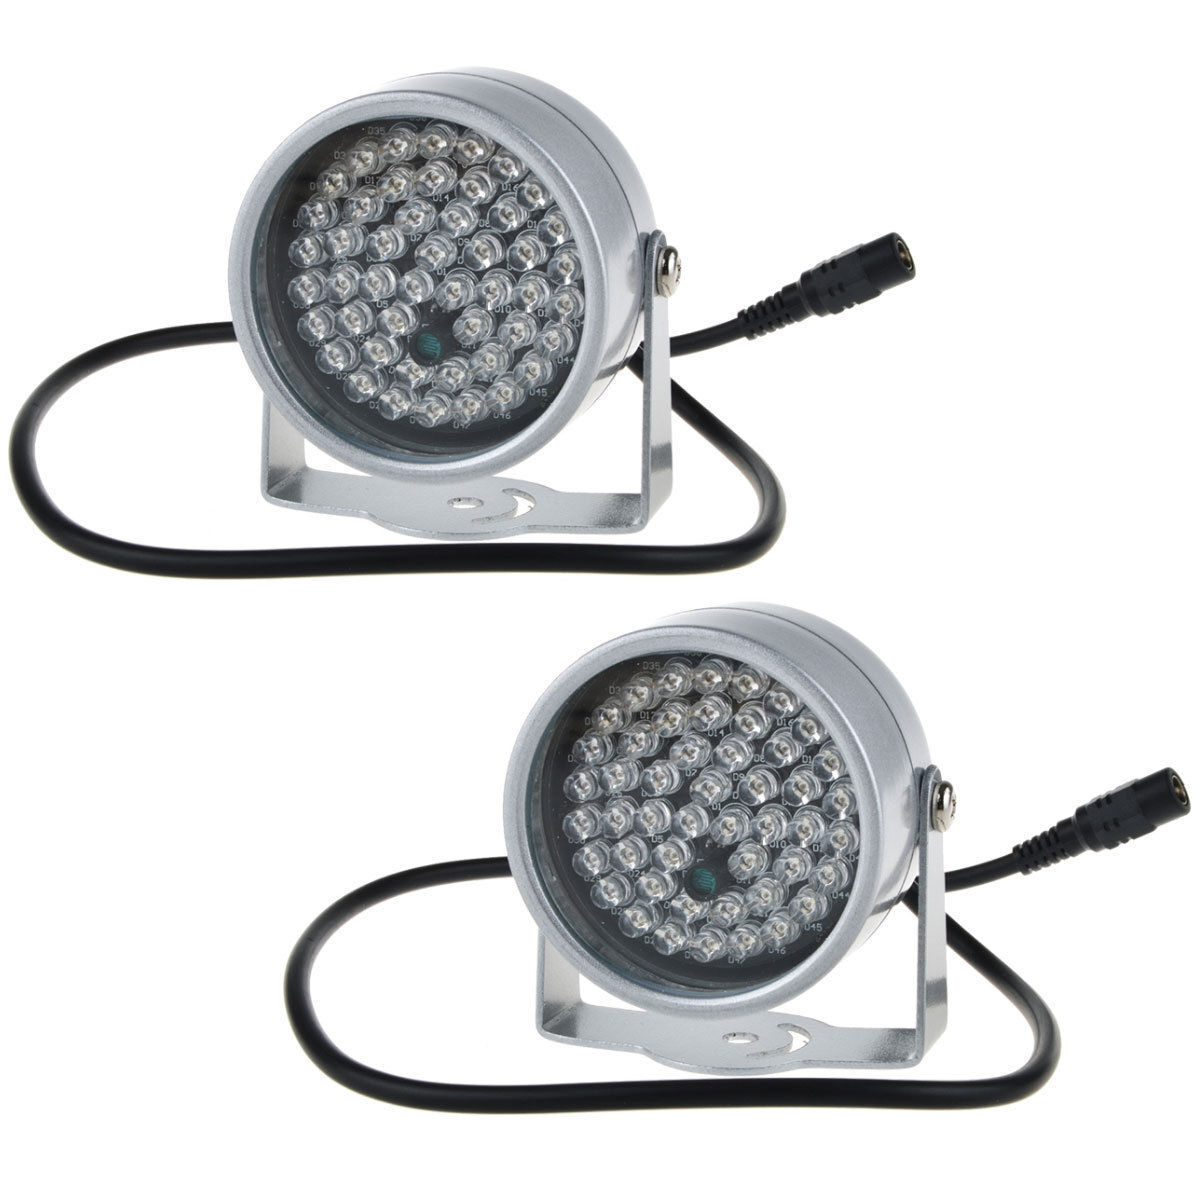 2pcs 48 LED Illuminator IR Infrared Night Vision Light for S